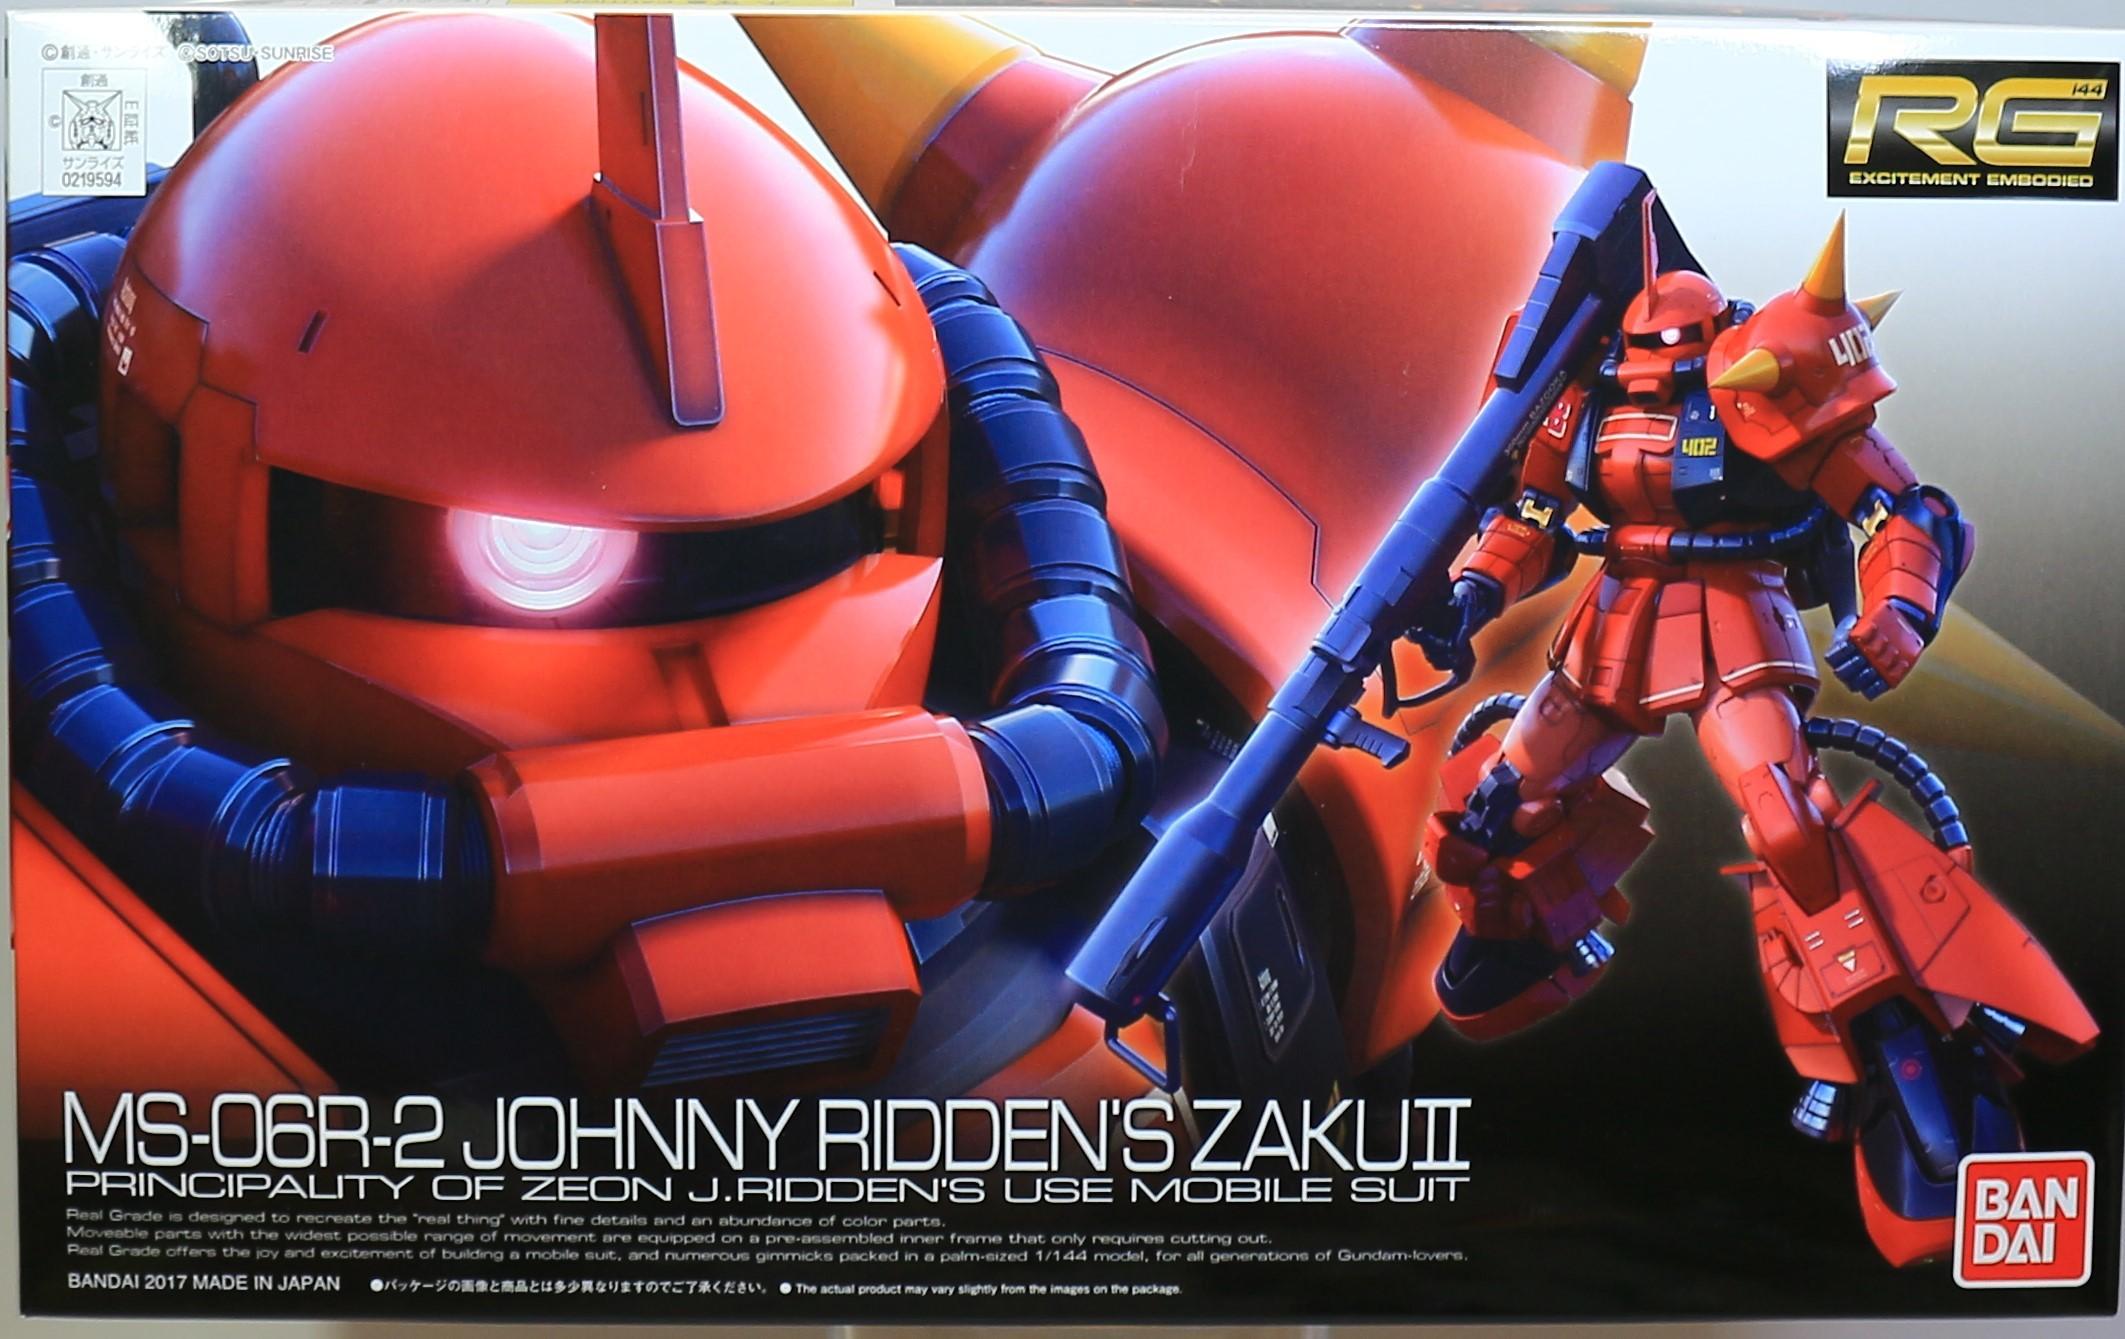 RG-JONNYs_ZAKU2-1.jpg